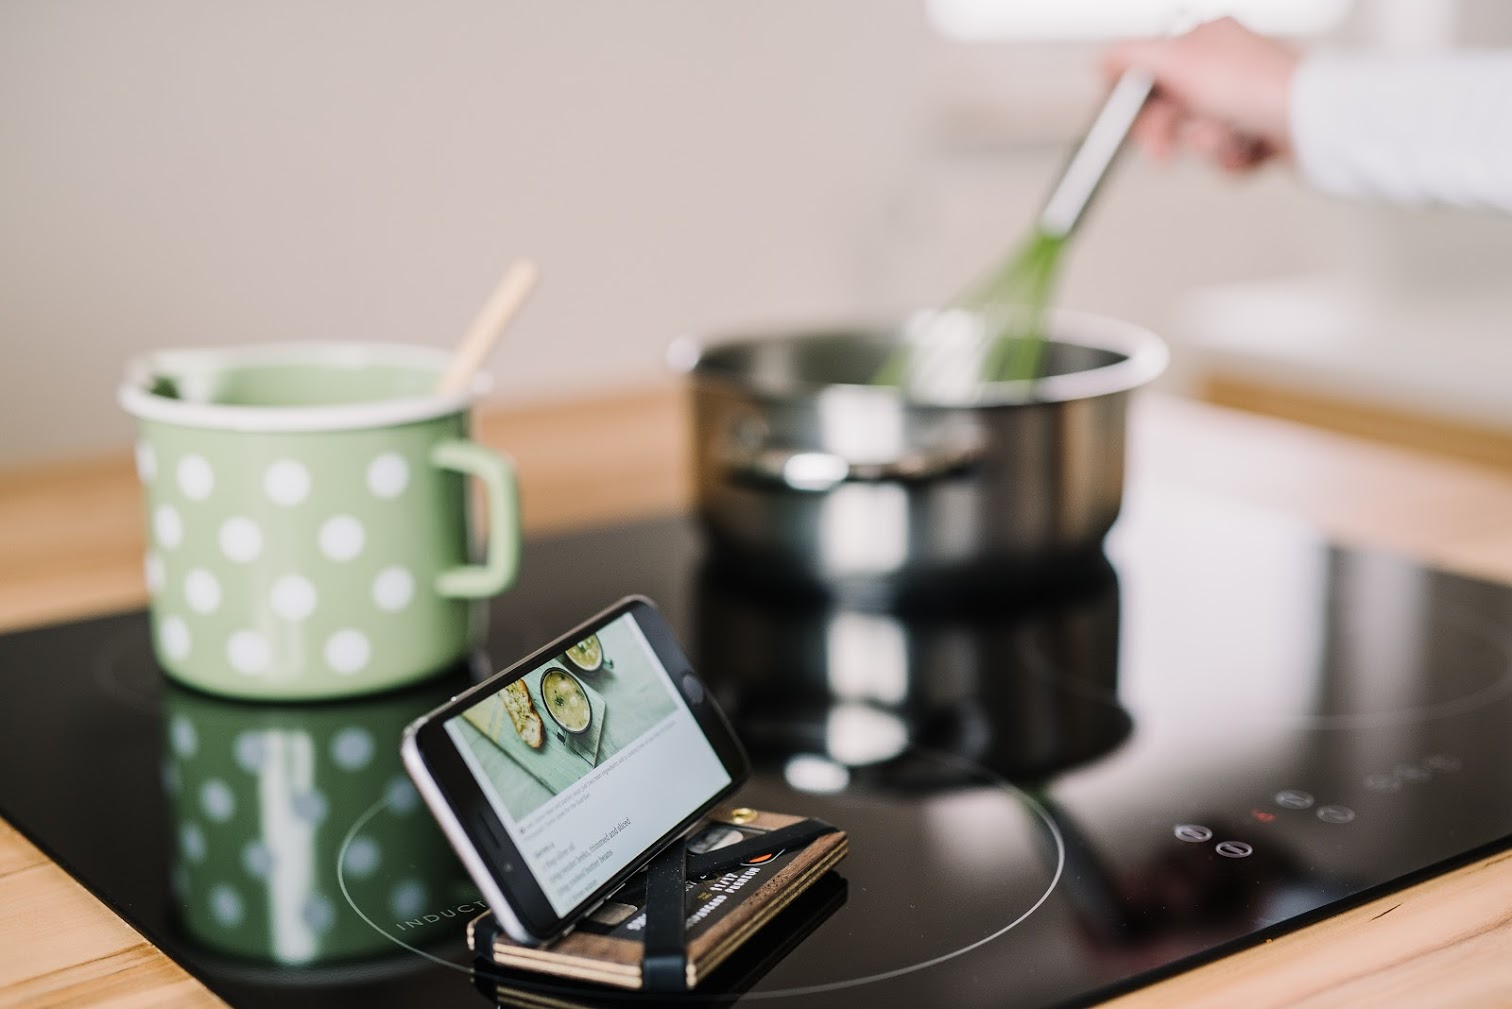 Hudwood_Xena_cooking